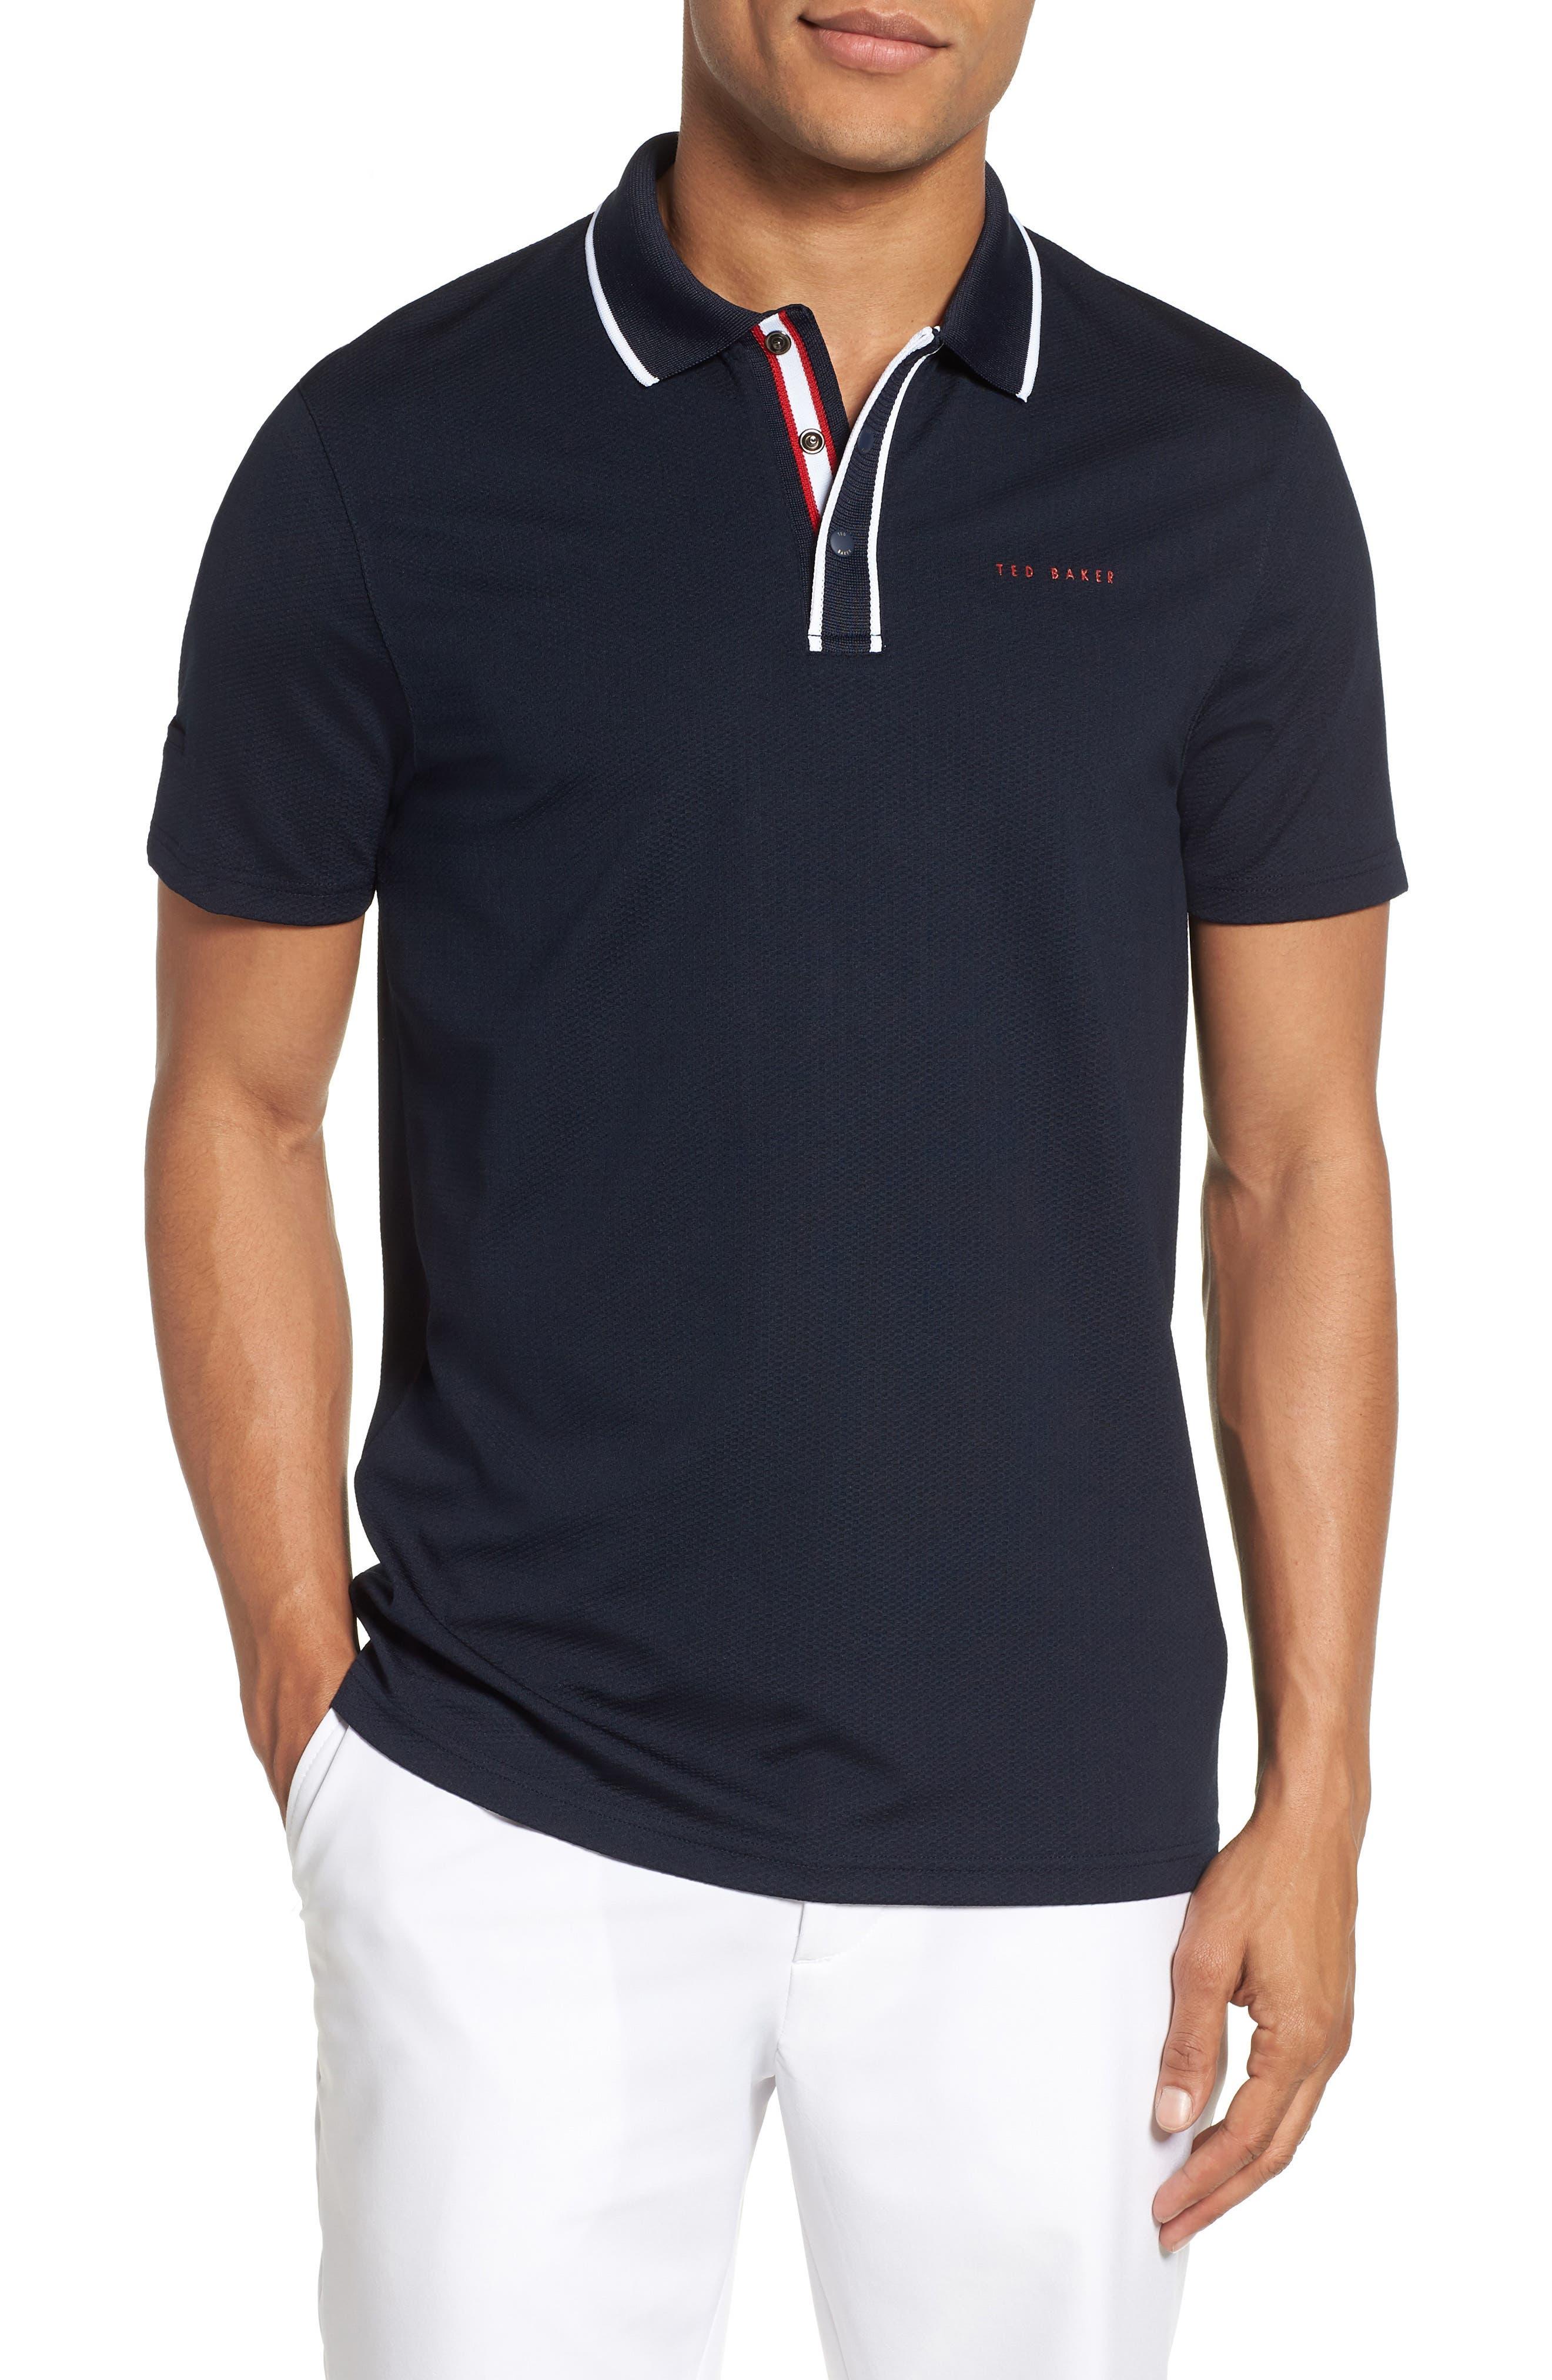 Bunka Trim Fit Golf Polo,                         Main,                         color, NAVY